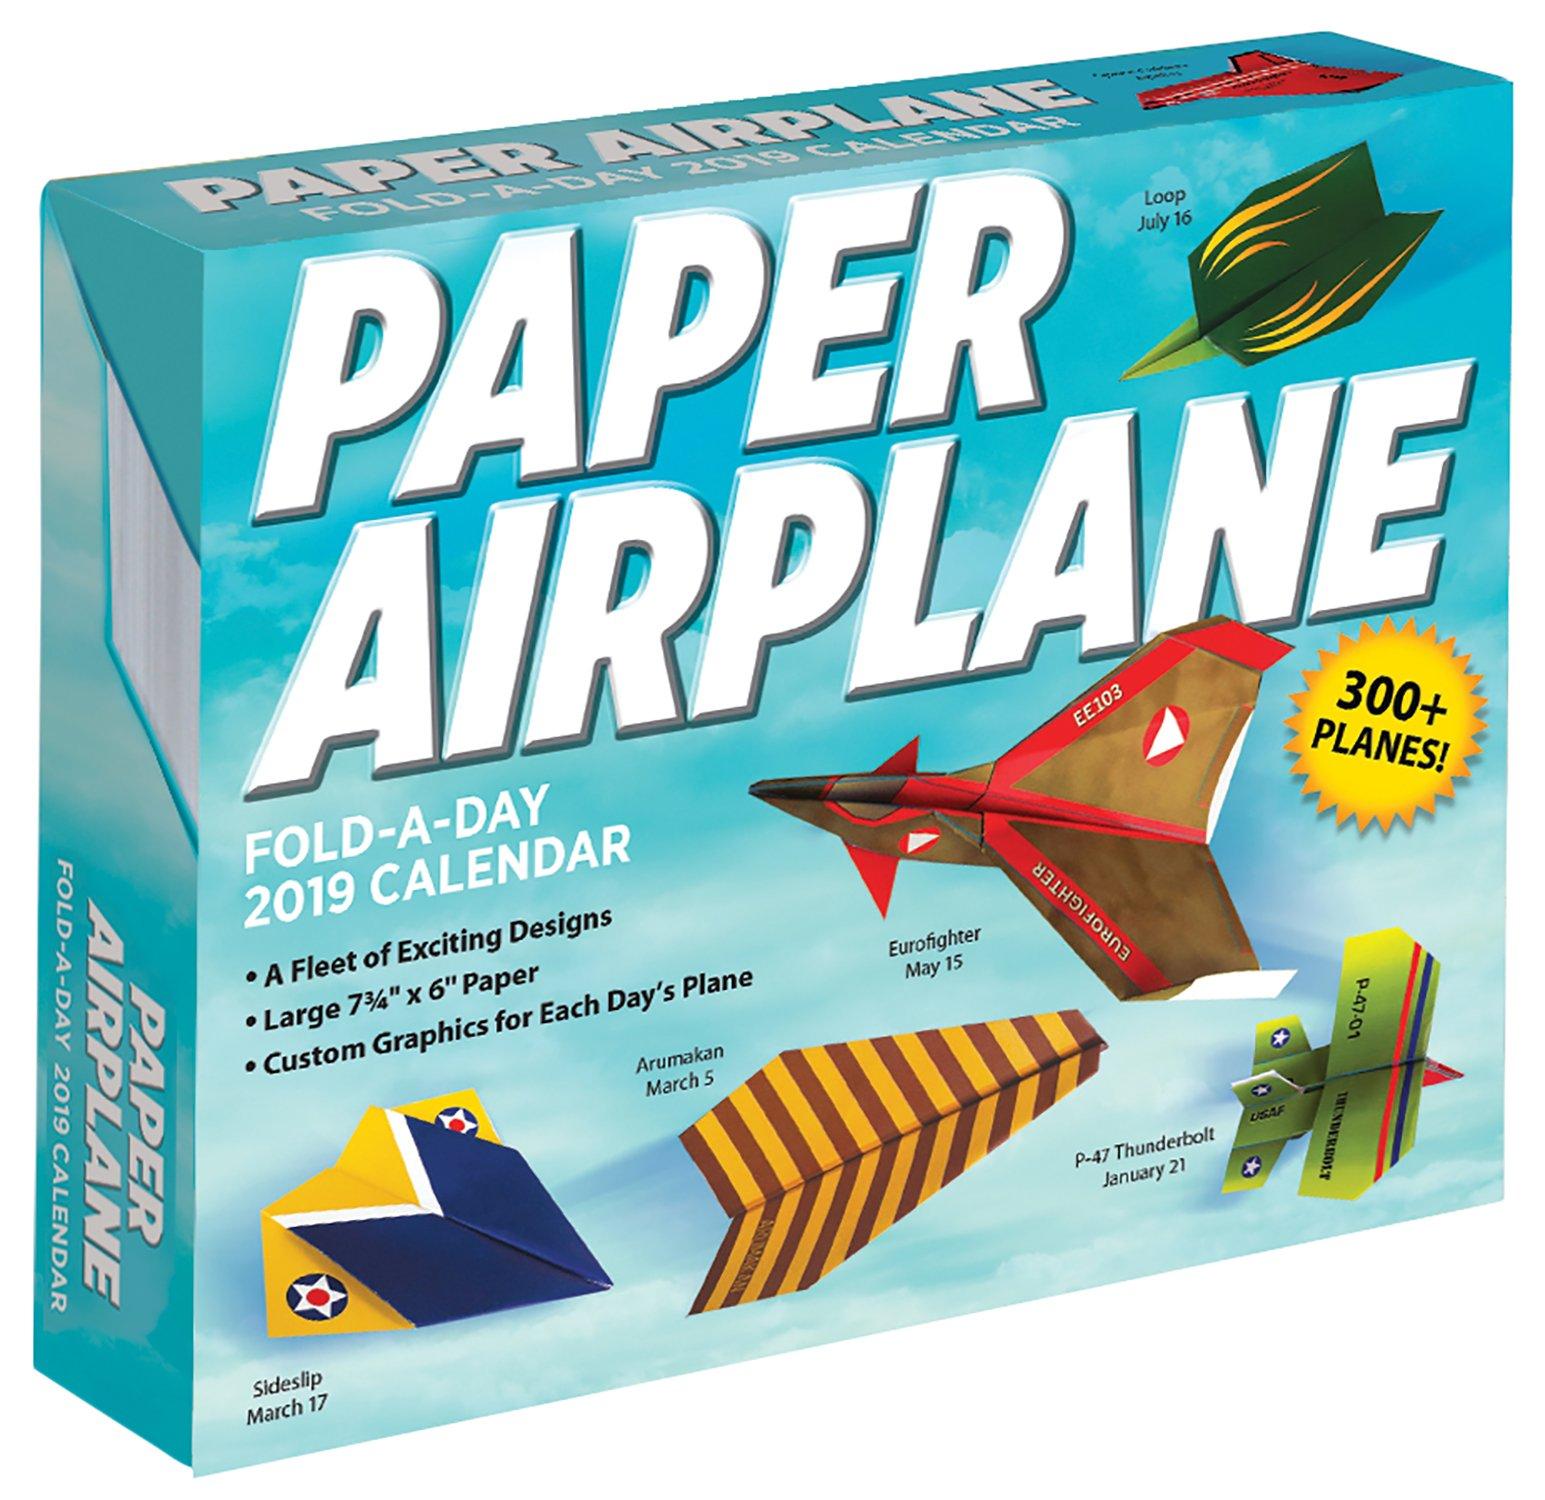 Paper Airplane Fold-a-Day 2019 Calendar